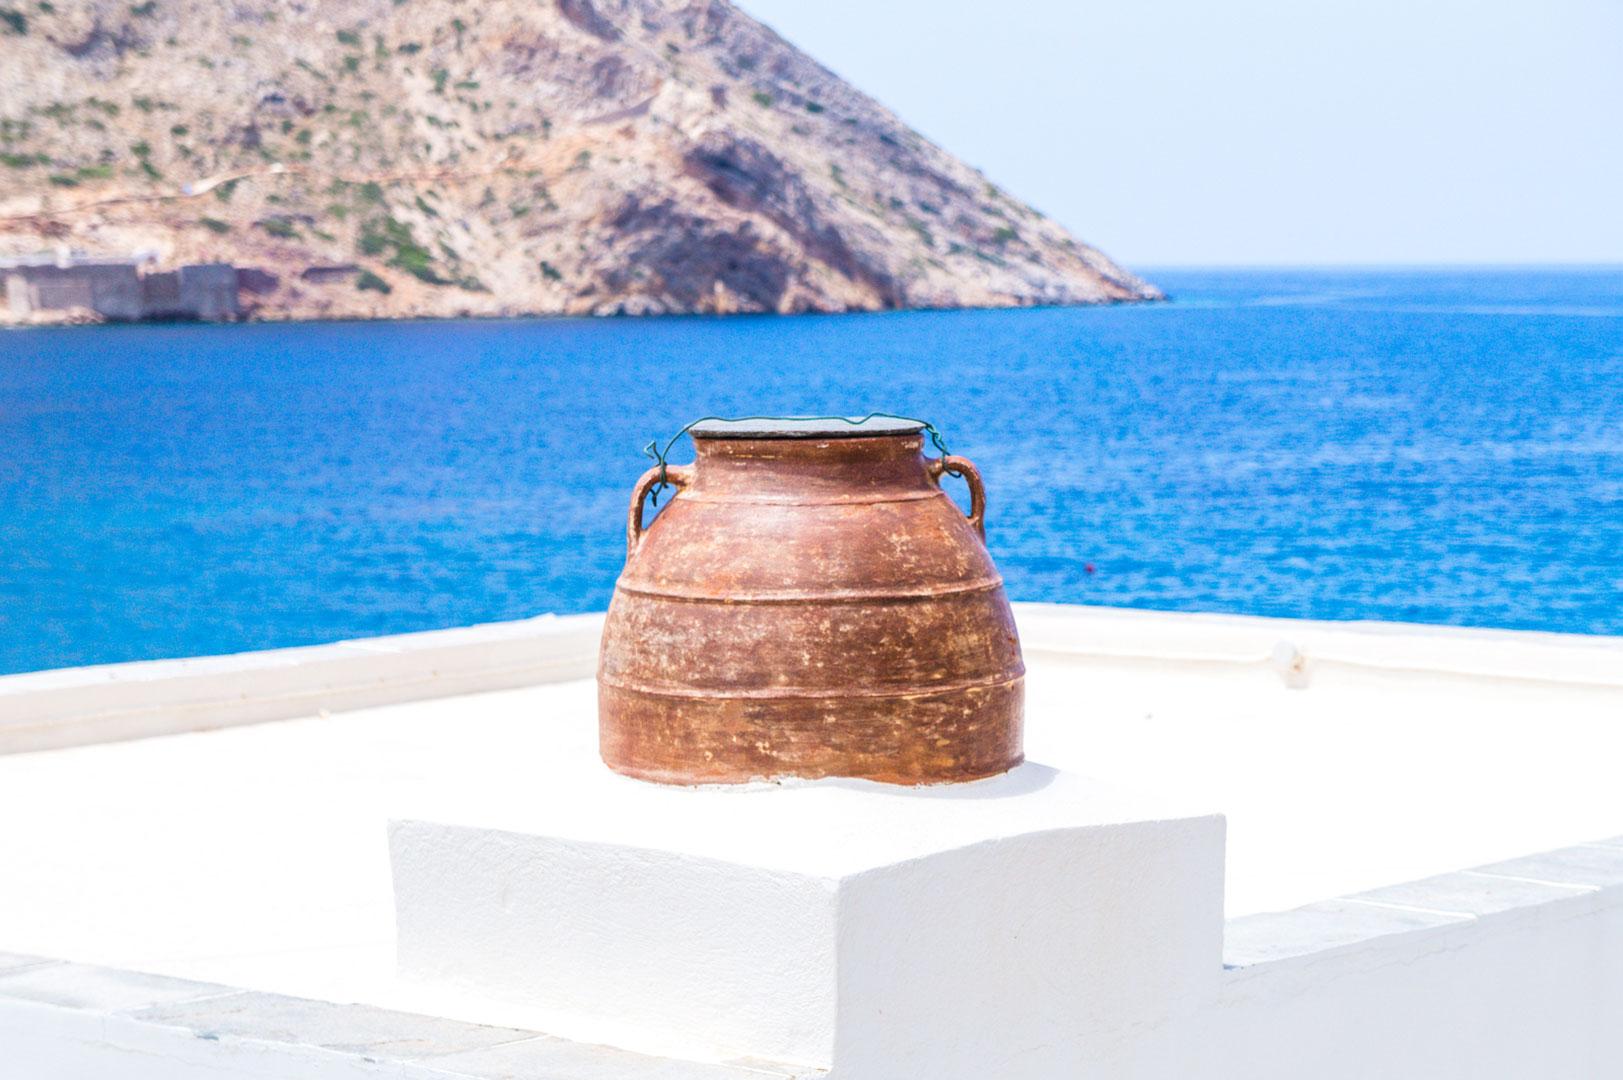 sifnos-greece-la-vie-en-blog-all-rights-reserved-40